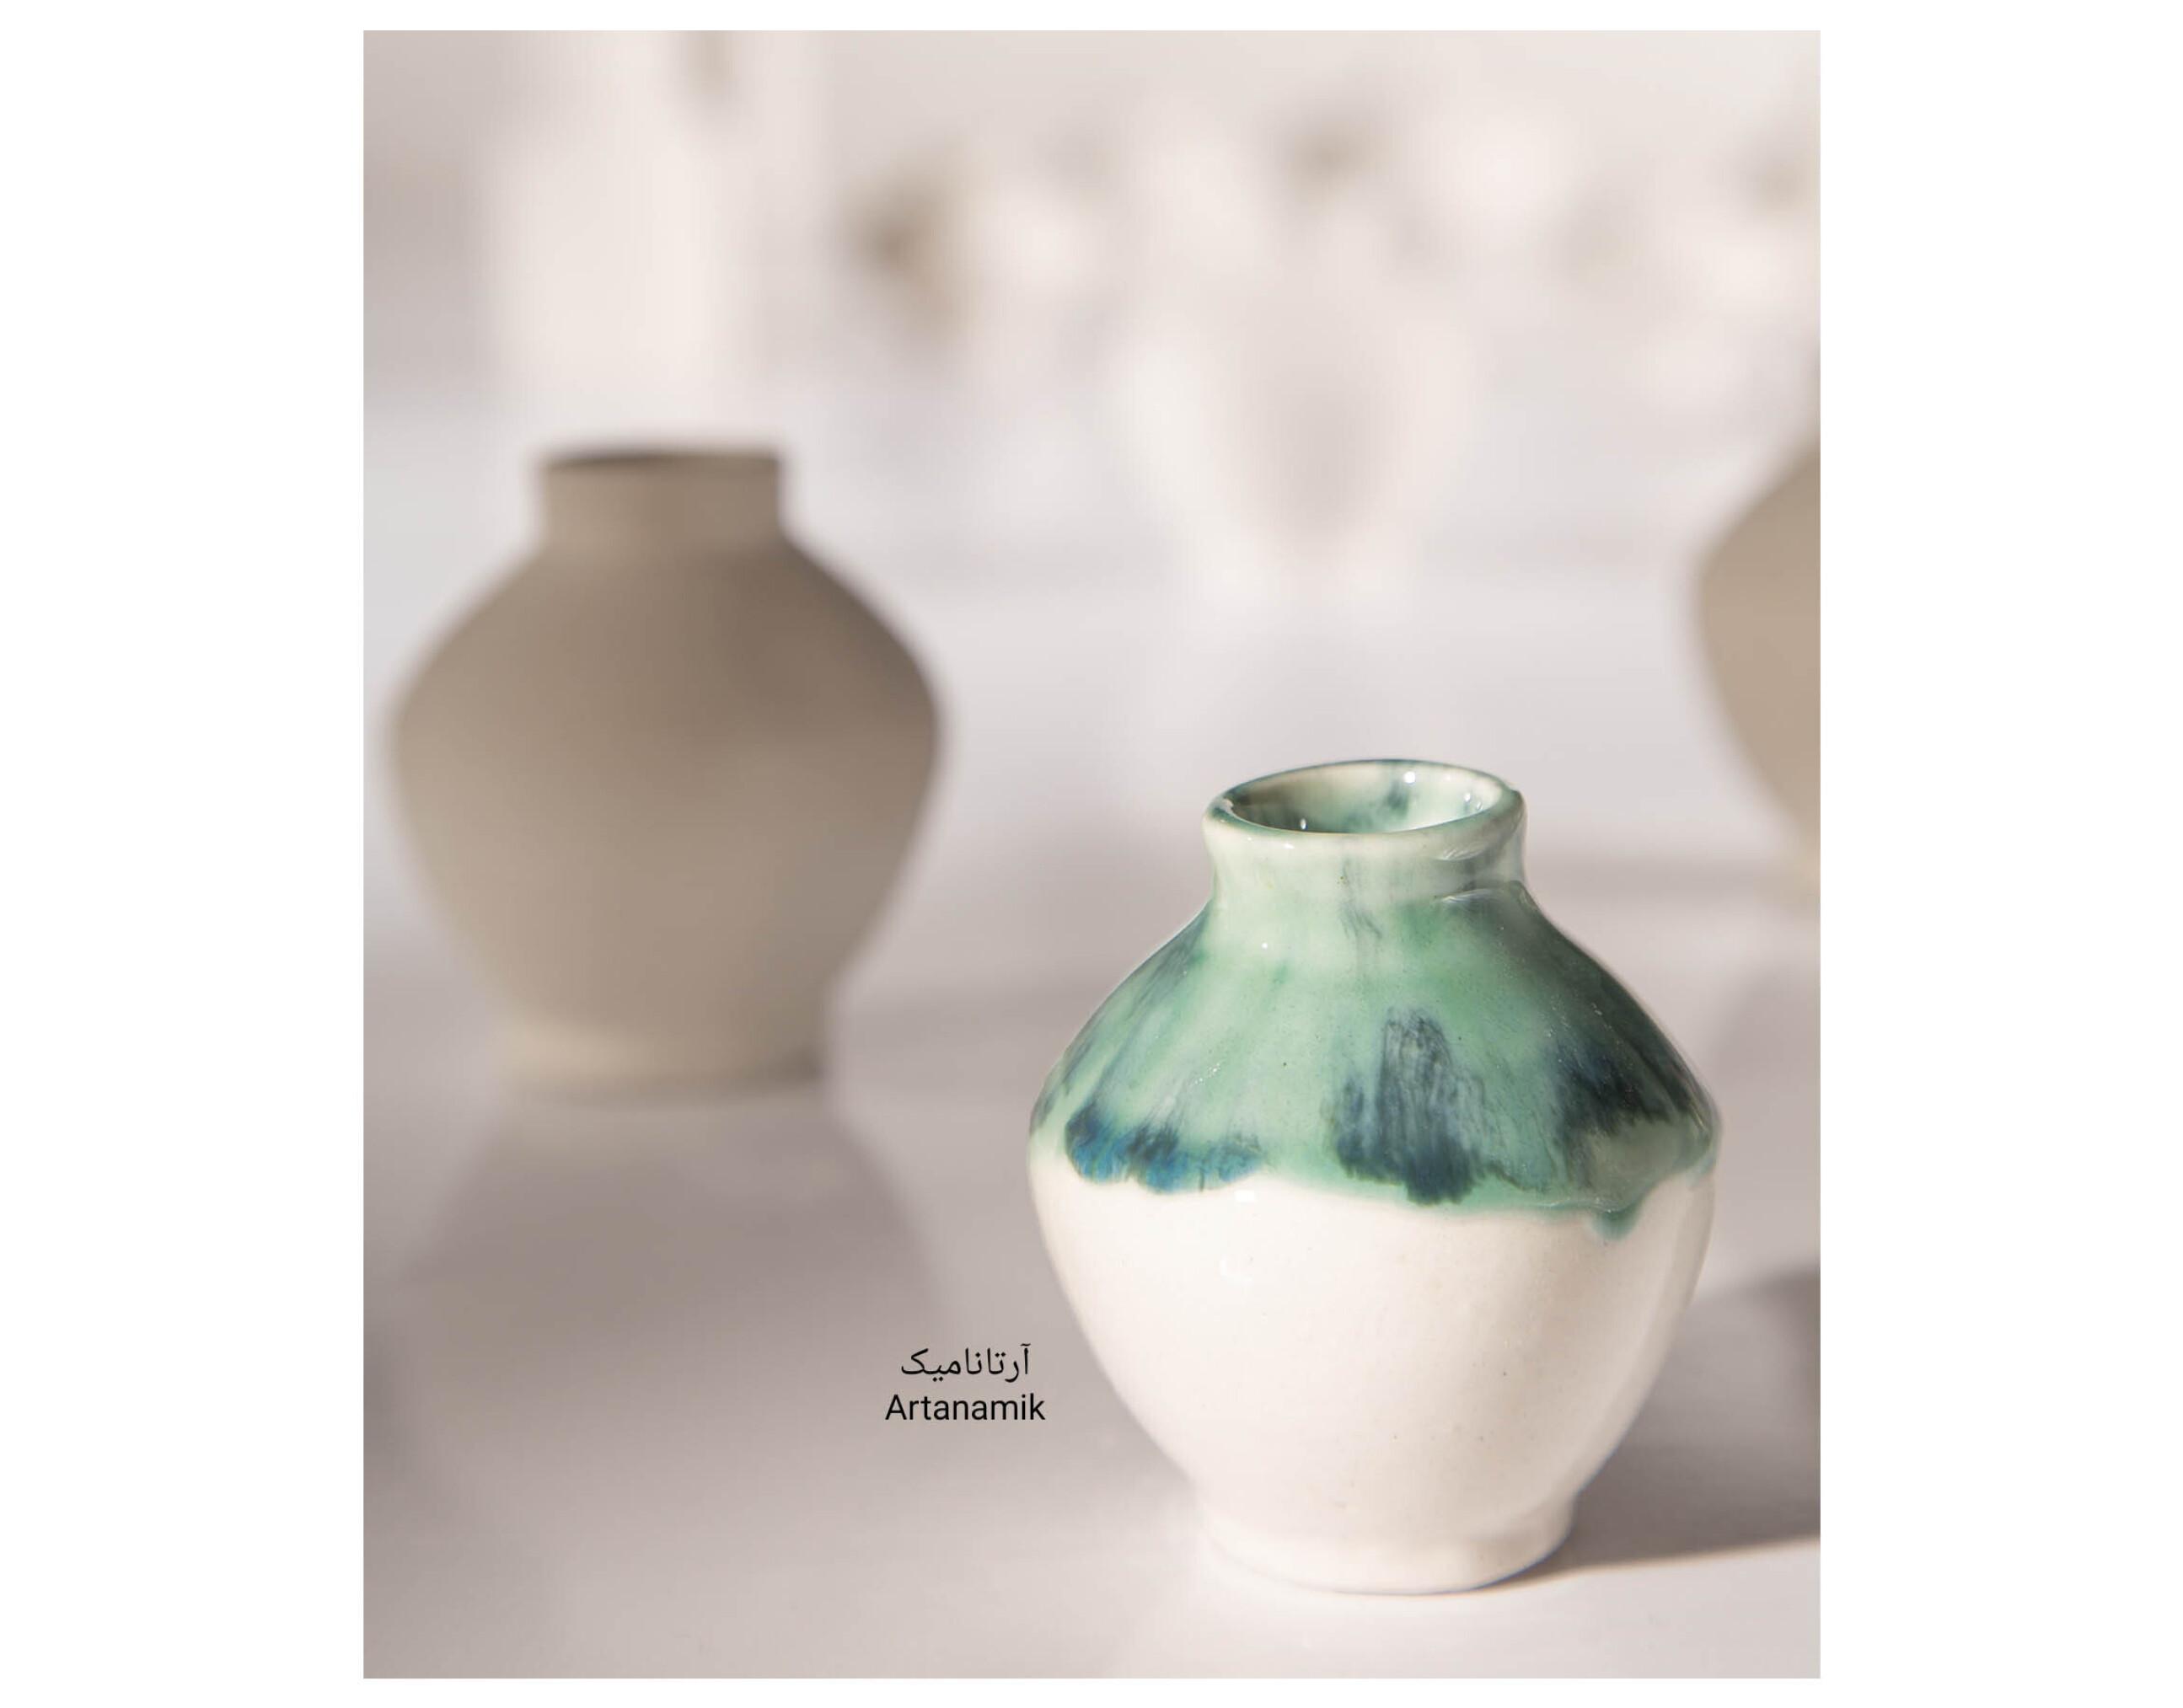 گلدان سرامیکی-عطردان، گلدان کادویی و گلدان دکوری